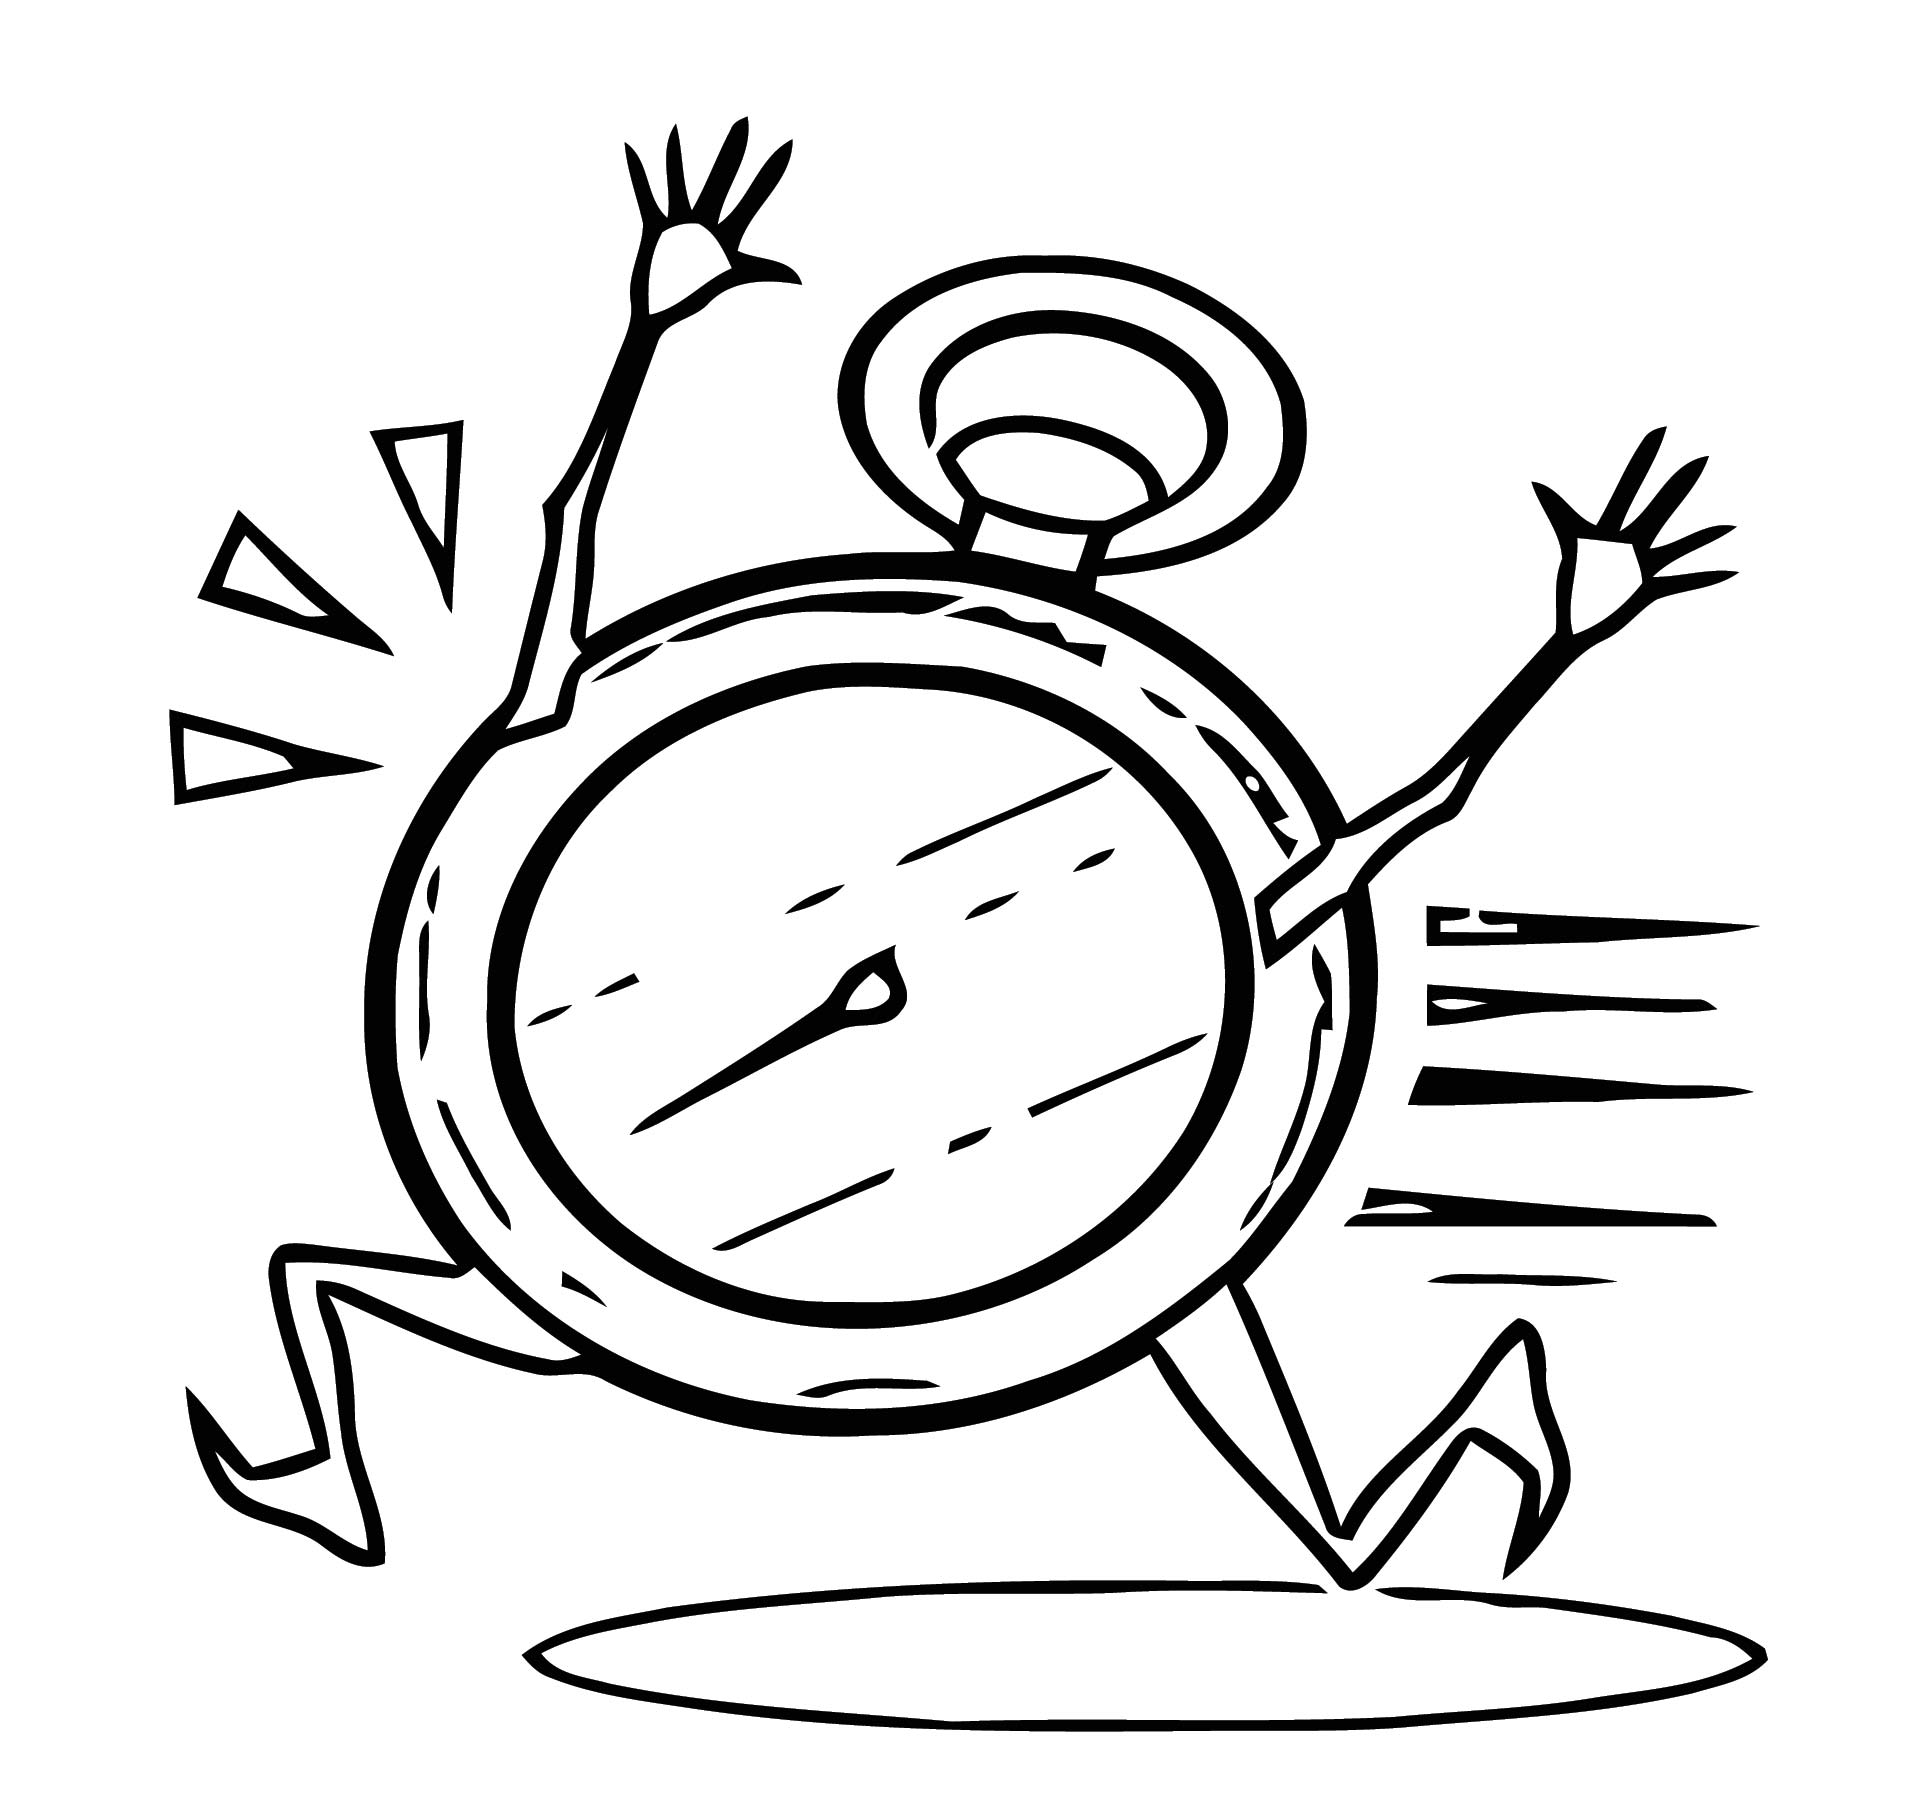 Clock 1 Free Printable Cartoonized 1 Free Printable Coloring Page